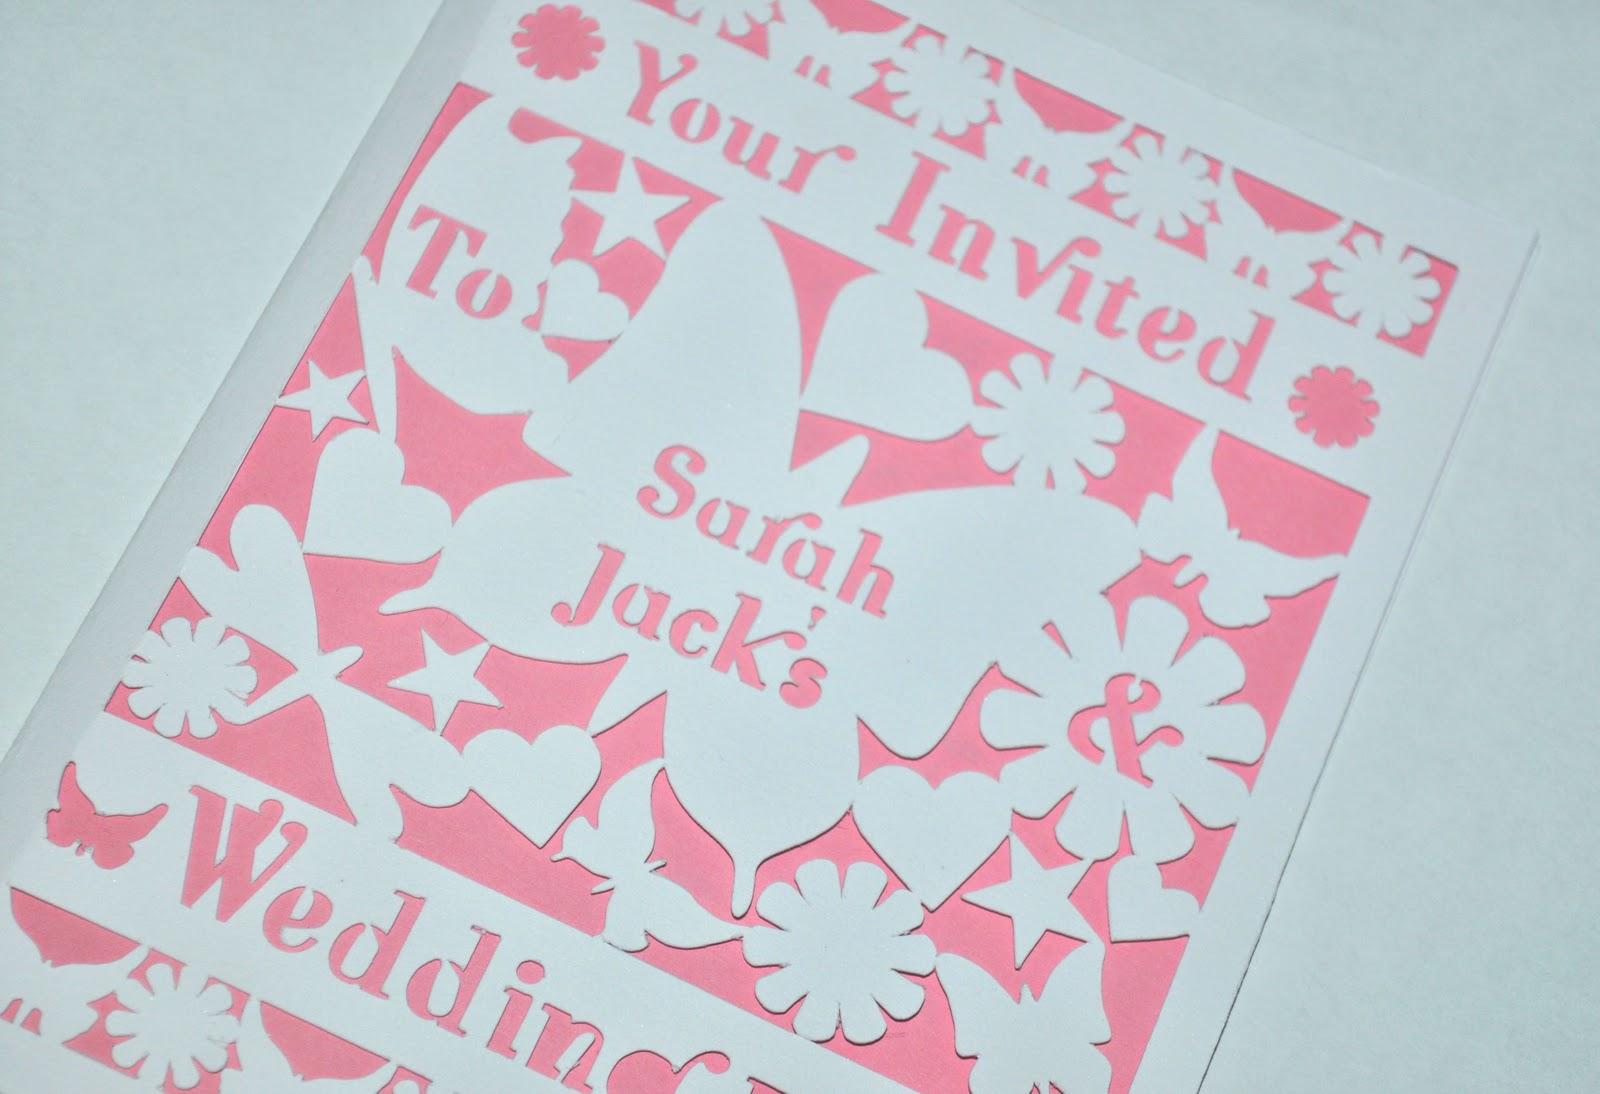 New Laser Cut Wedding Invitations Butterflies Hearts Flowers: Pea Wedding Invitations Cut Out At Websimilar.org